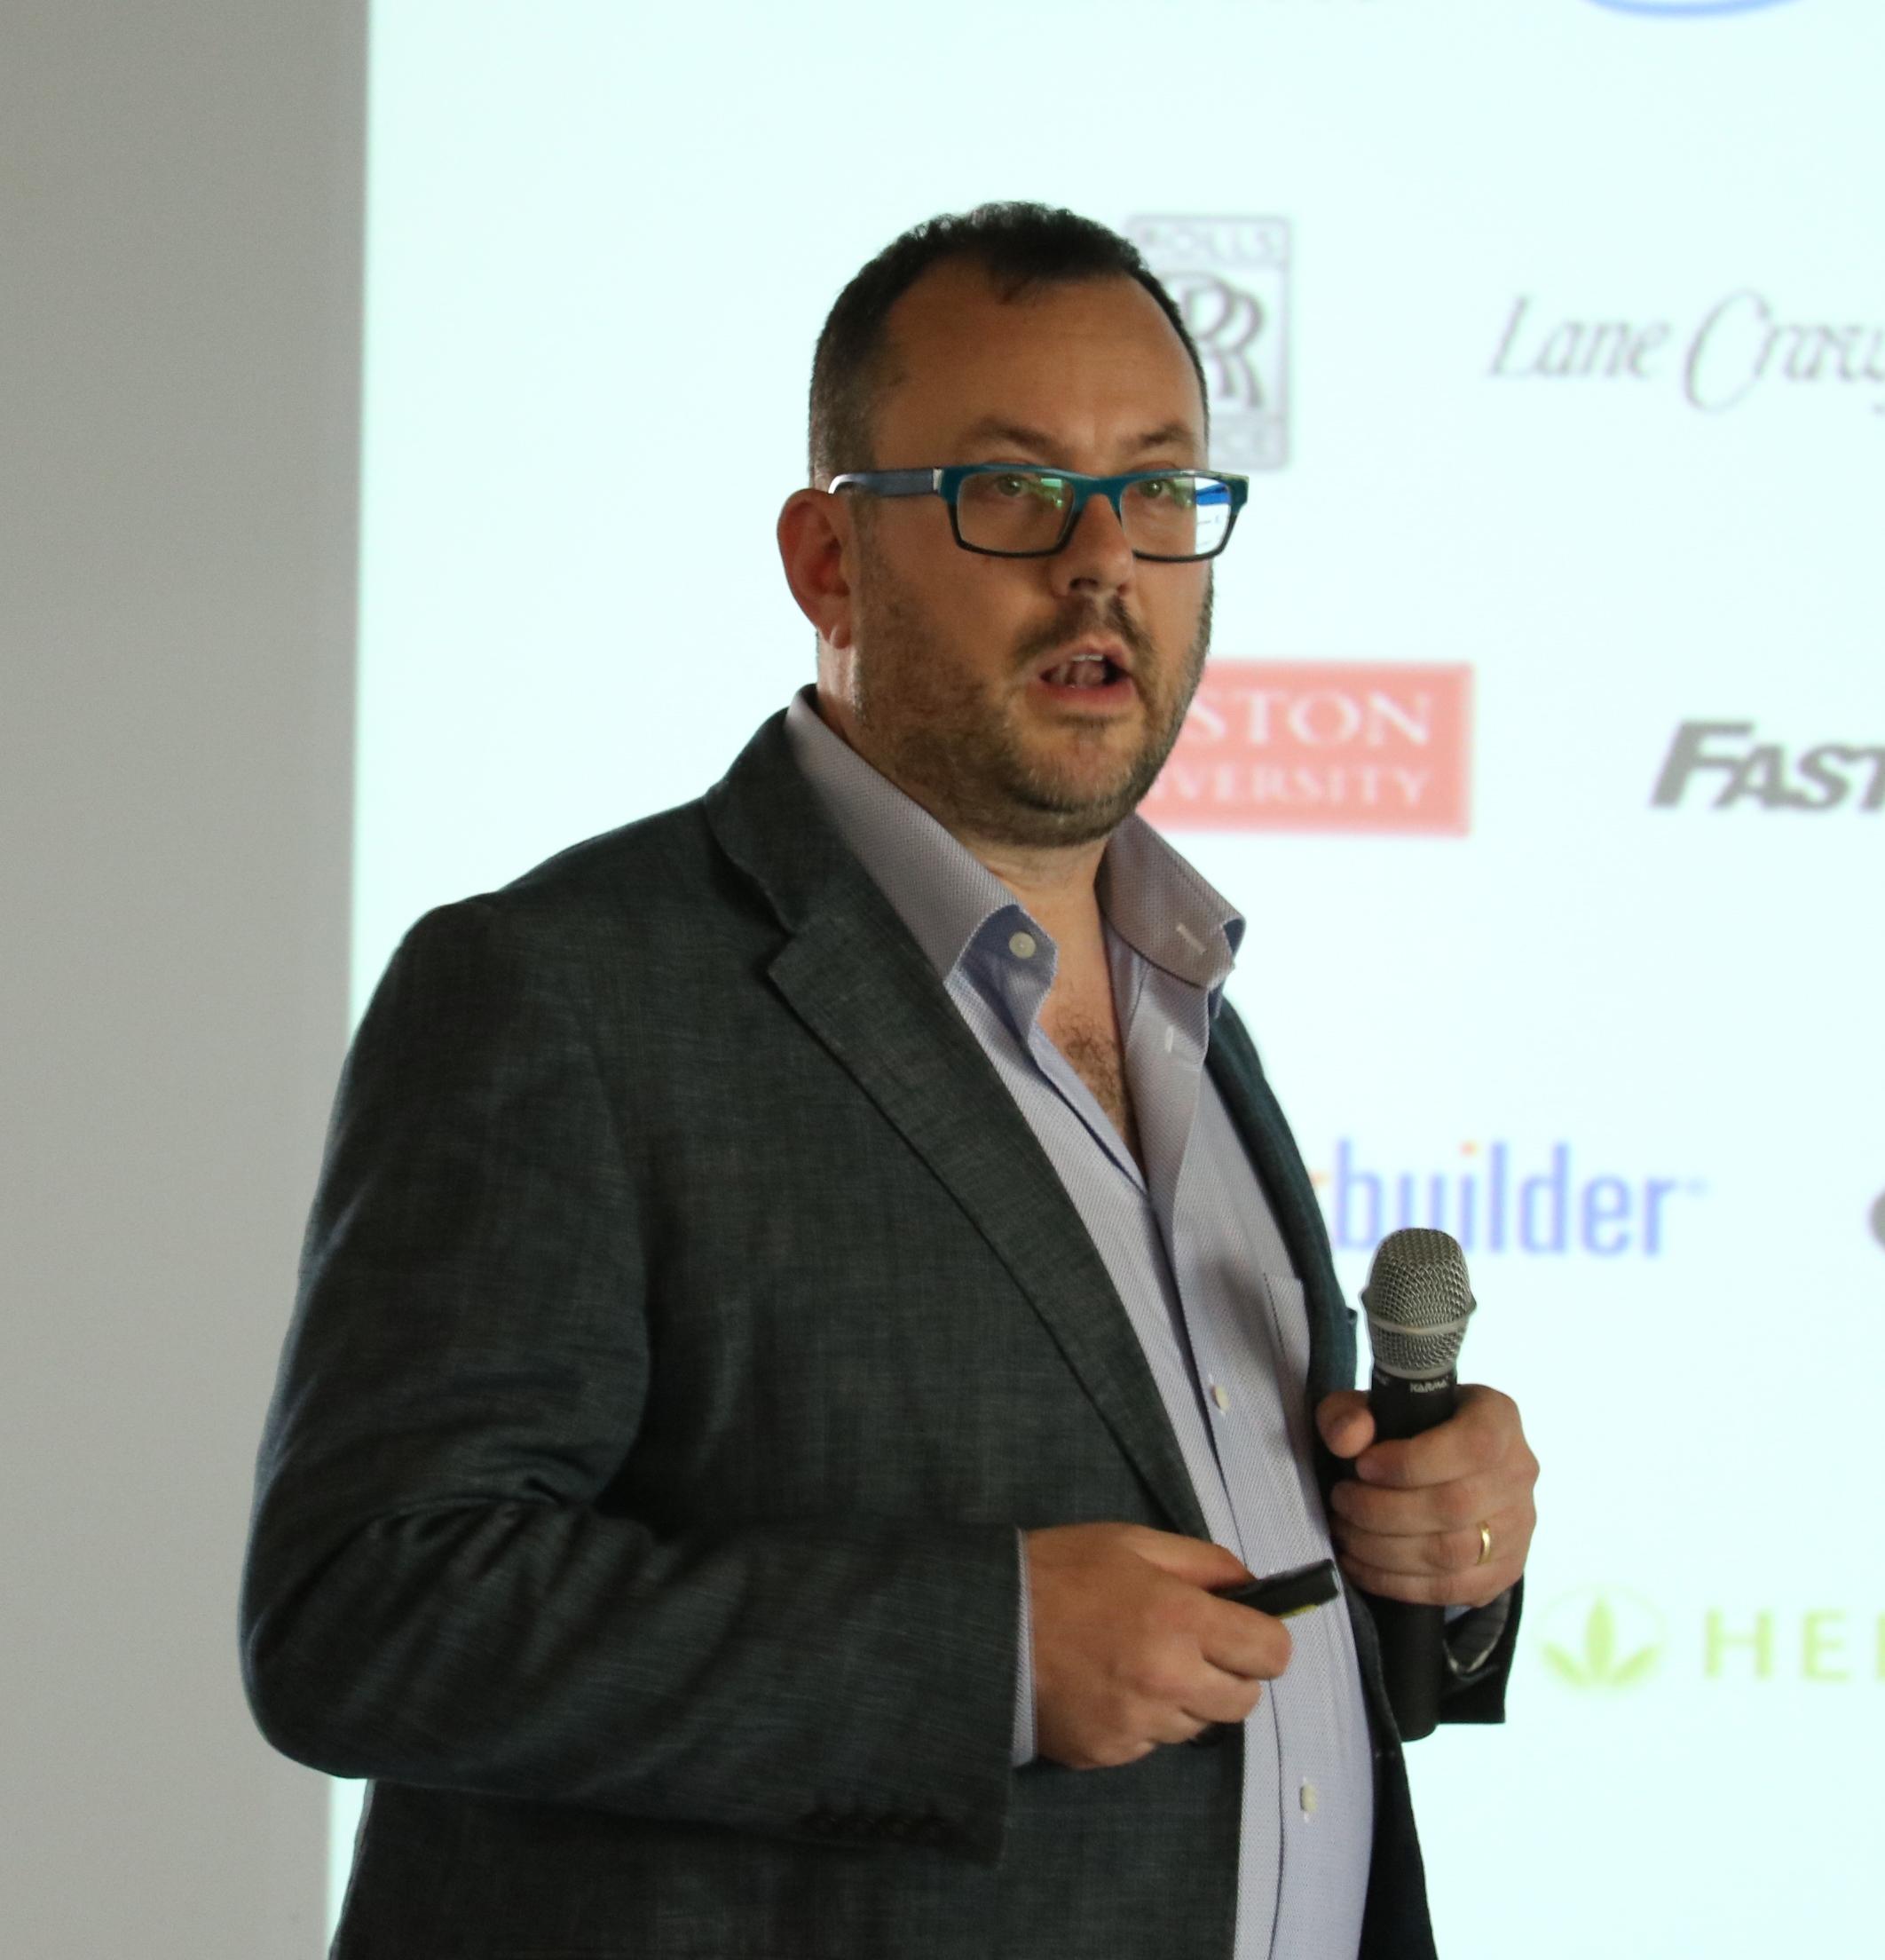 Mark Blair, Vice President EMEA di Brightcove